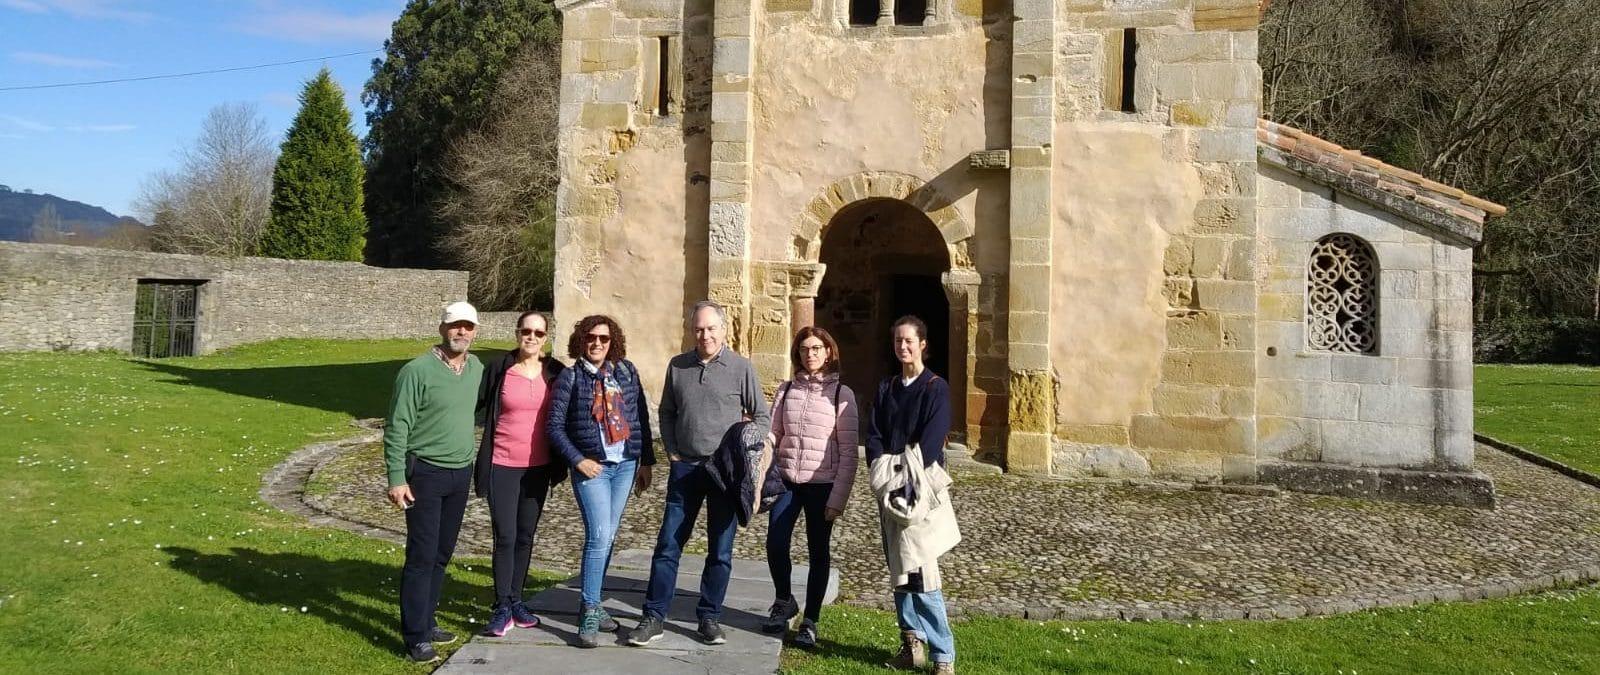 Excursión y visita a Iglesia prerrománica de San Salvador de Valdediós,